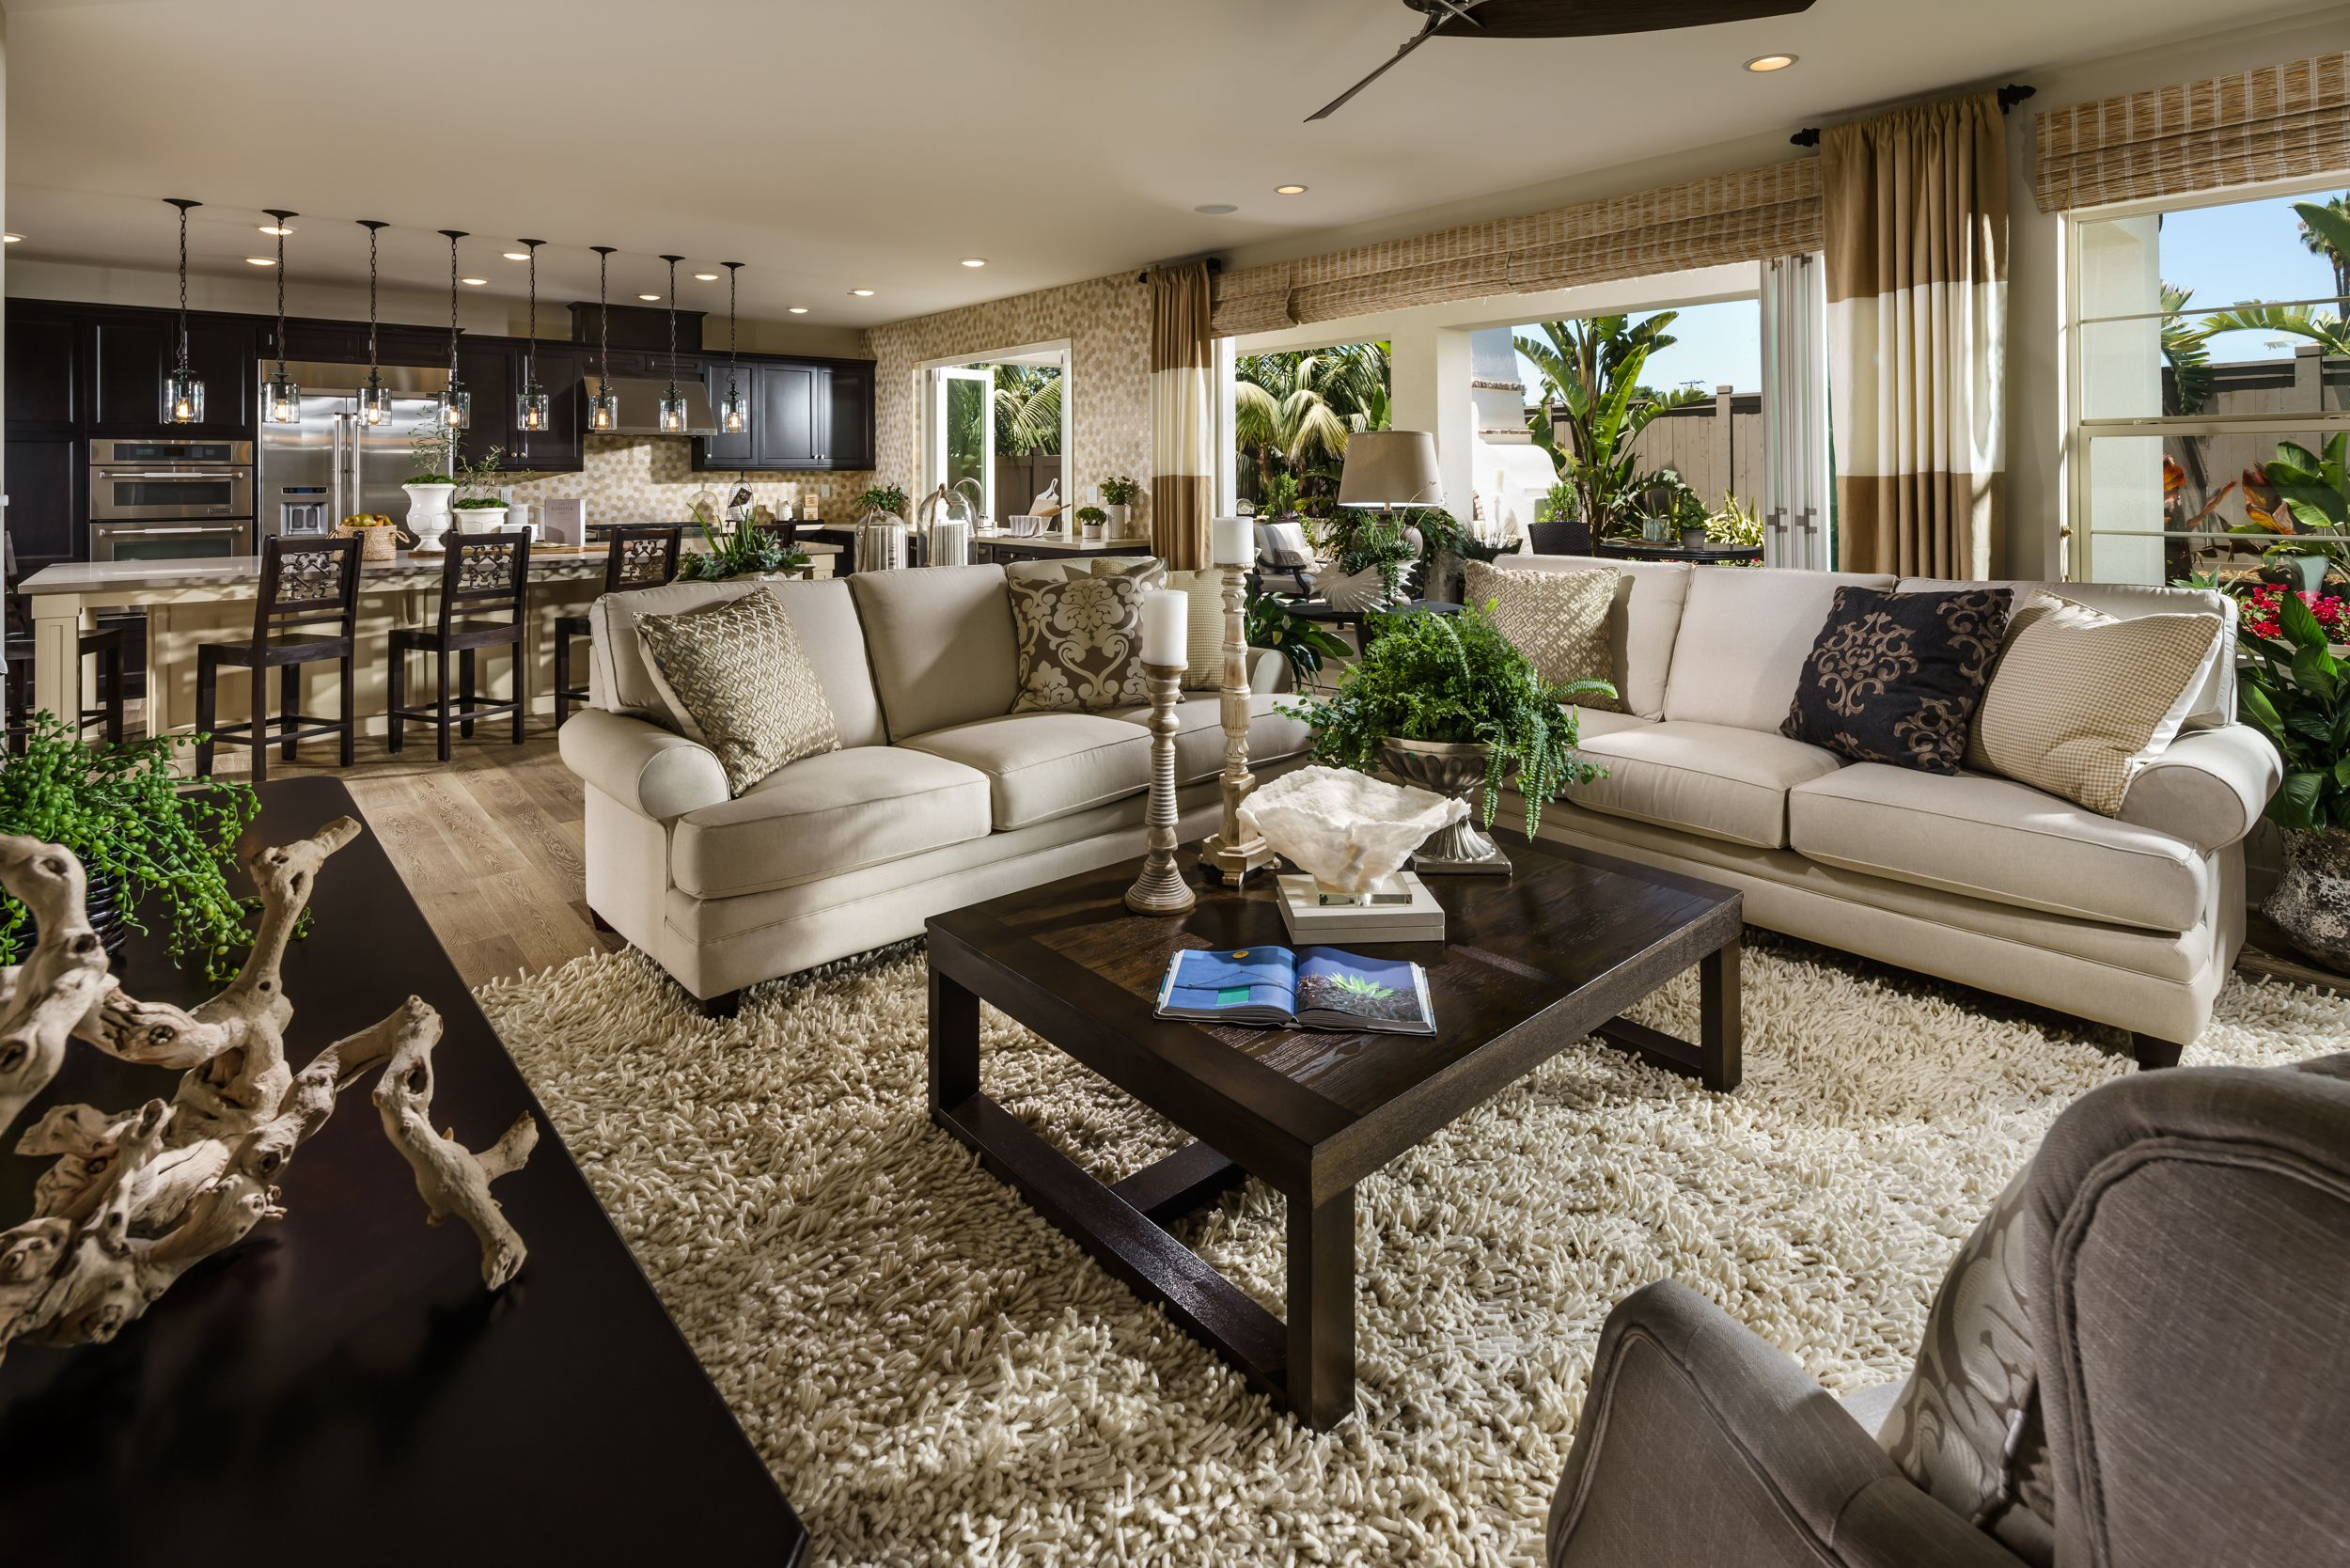 Shea Home Design Studio. Beach House  Plan 4 Living Room Open Floor plans Design Encinitas